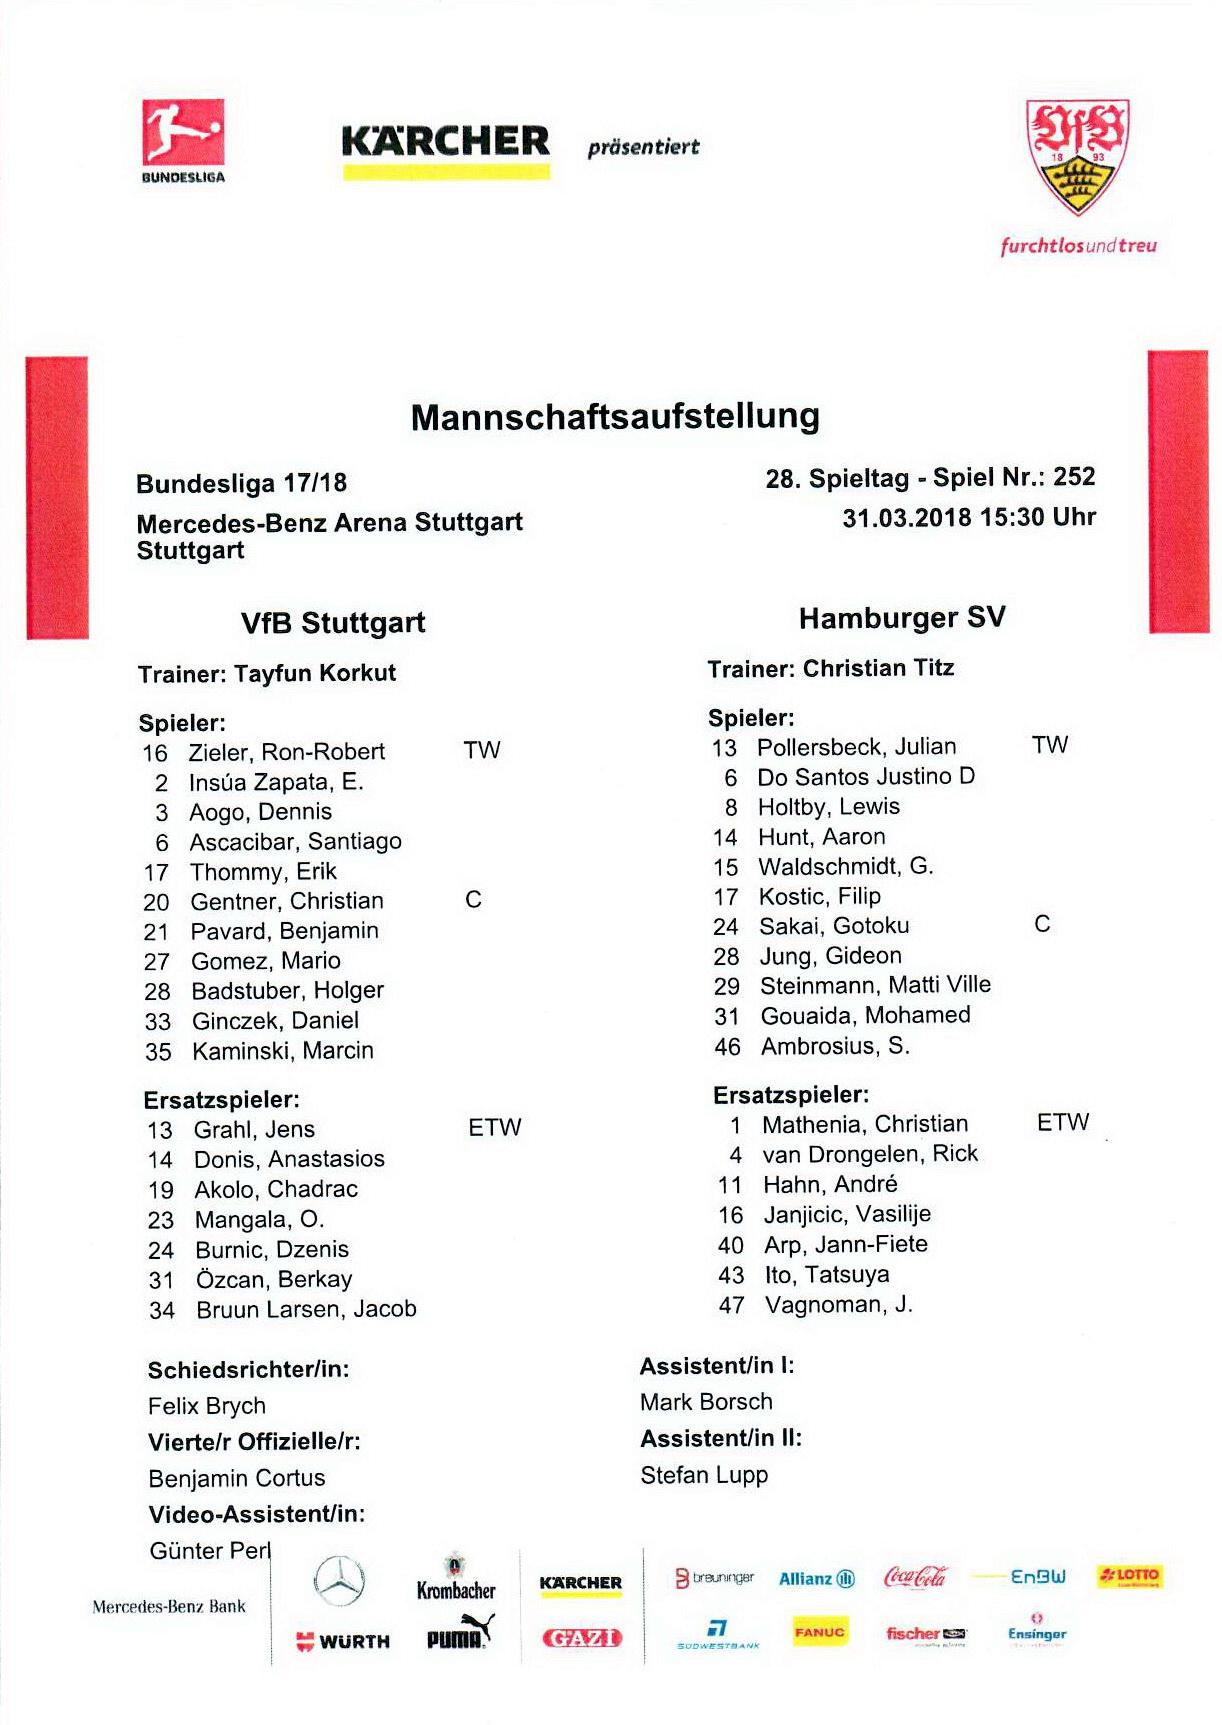 Vfb Stuttgart 1893 Vs Hamburger Sv Wwwsoke2de